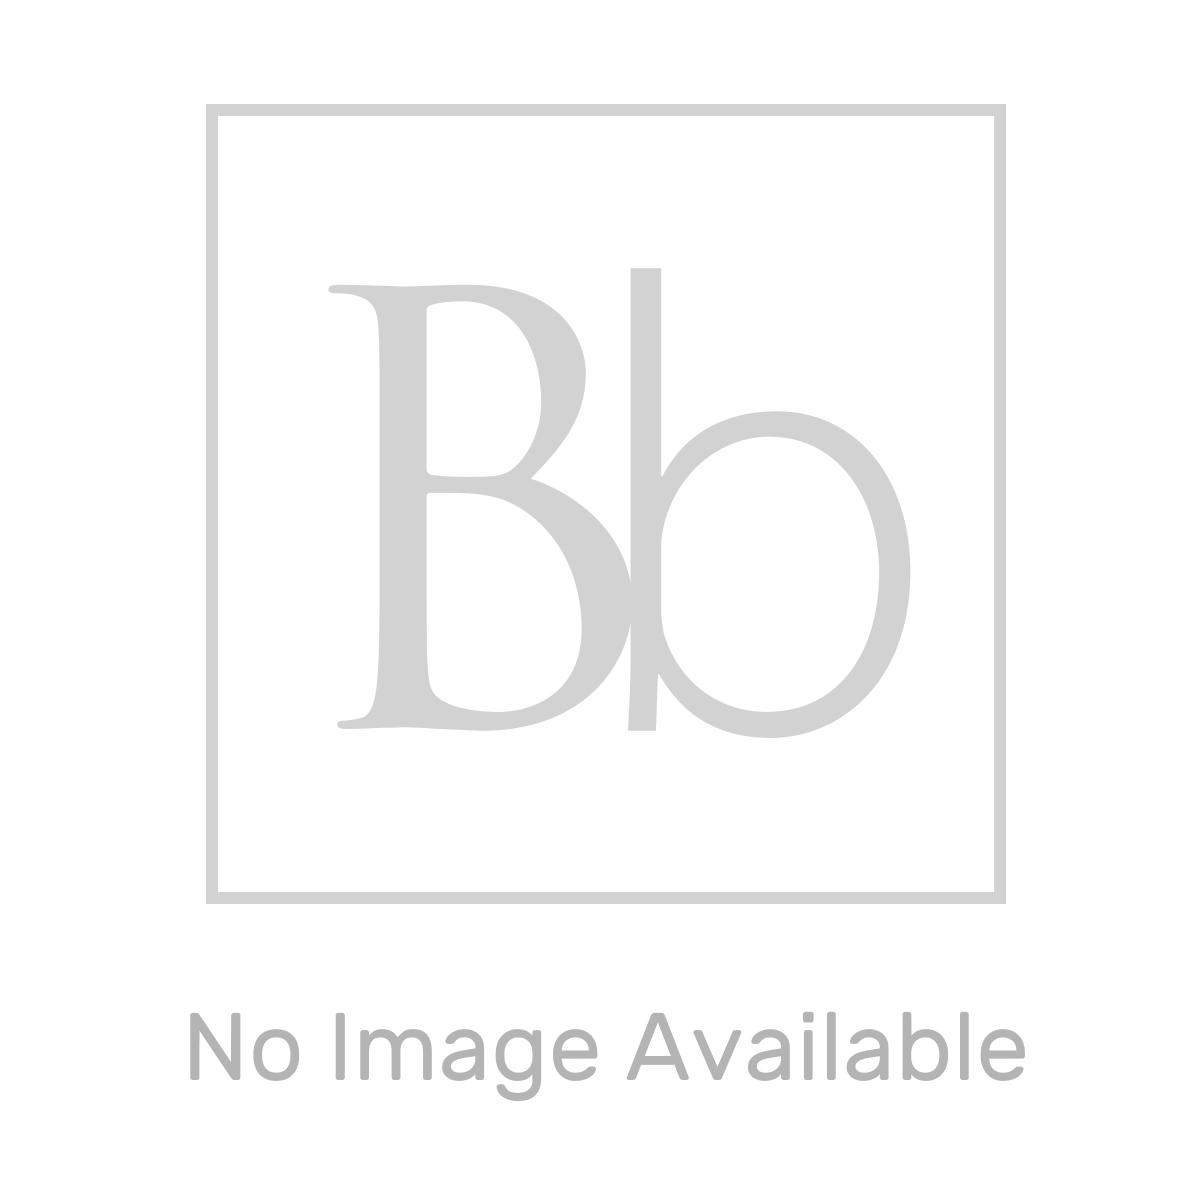 RAK Washington Black Freestanding Bath 1560mm Measurements